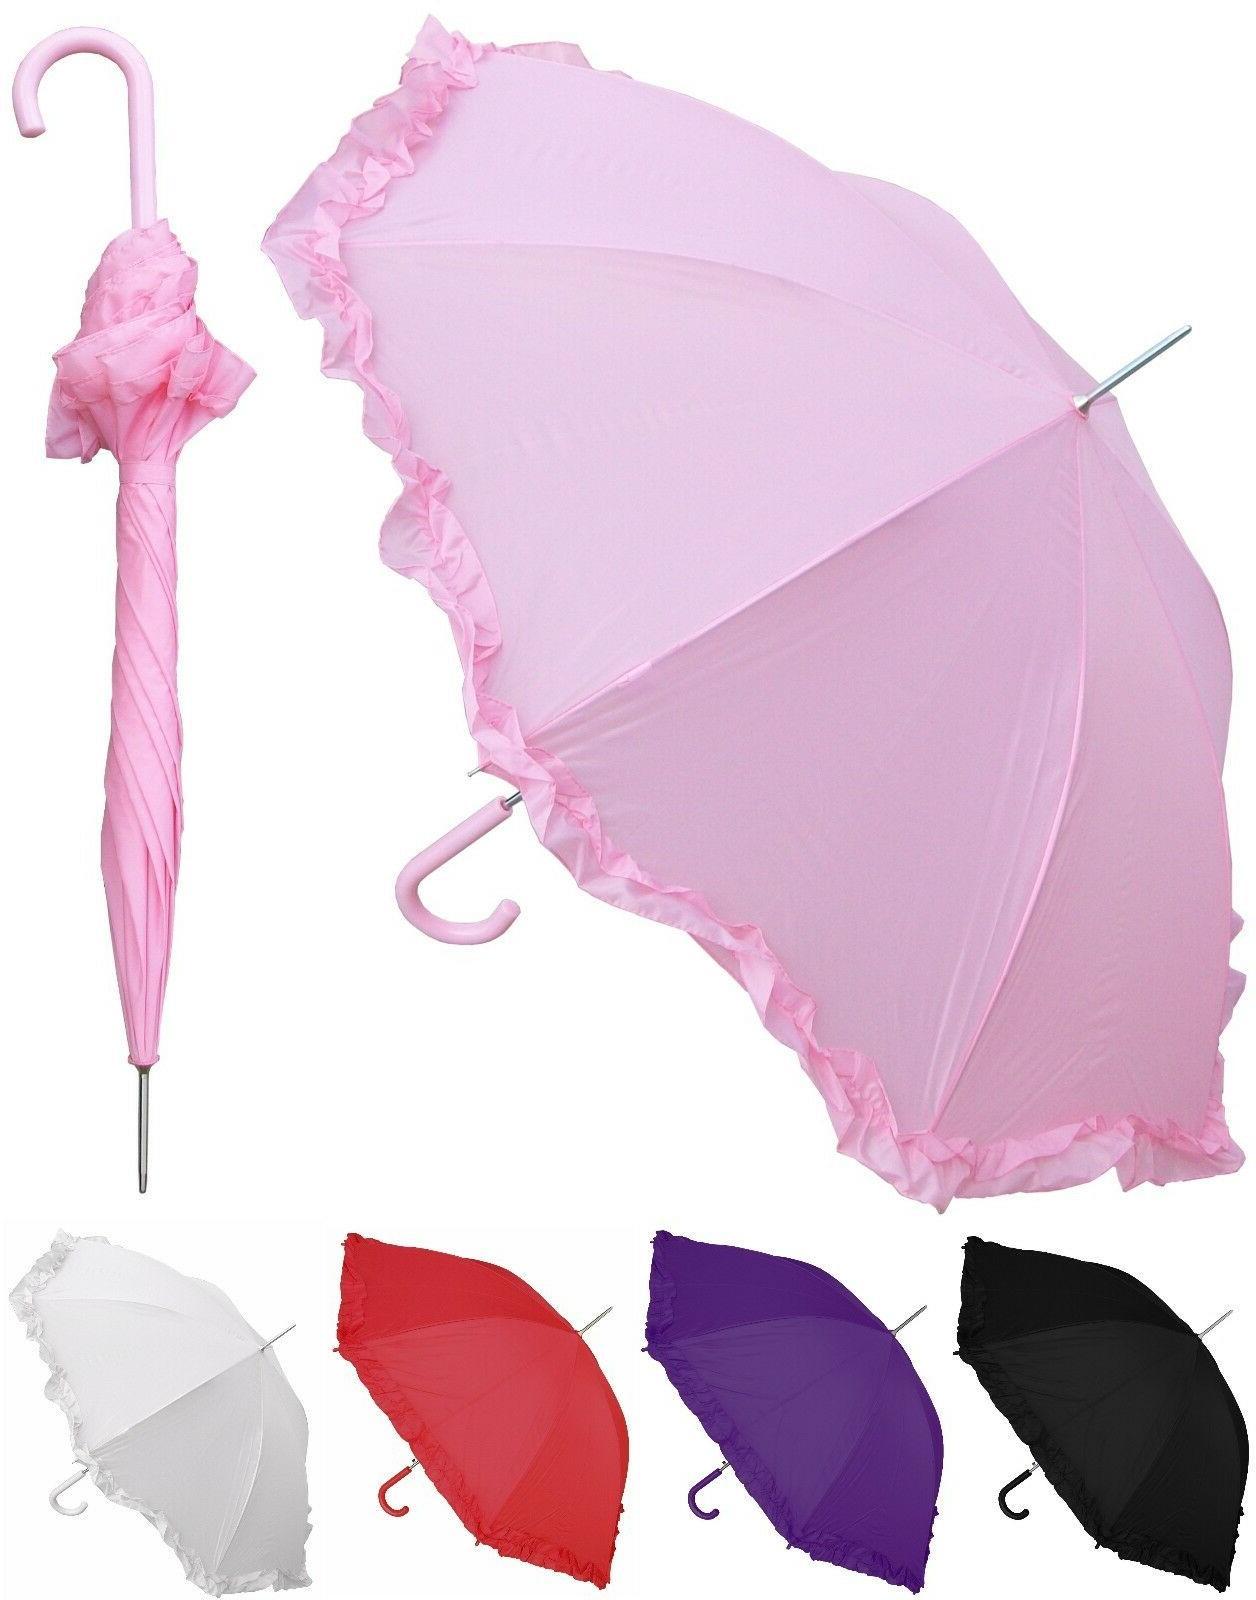 48 arc parasol style auto umbrella rain